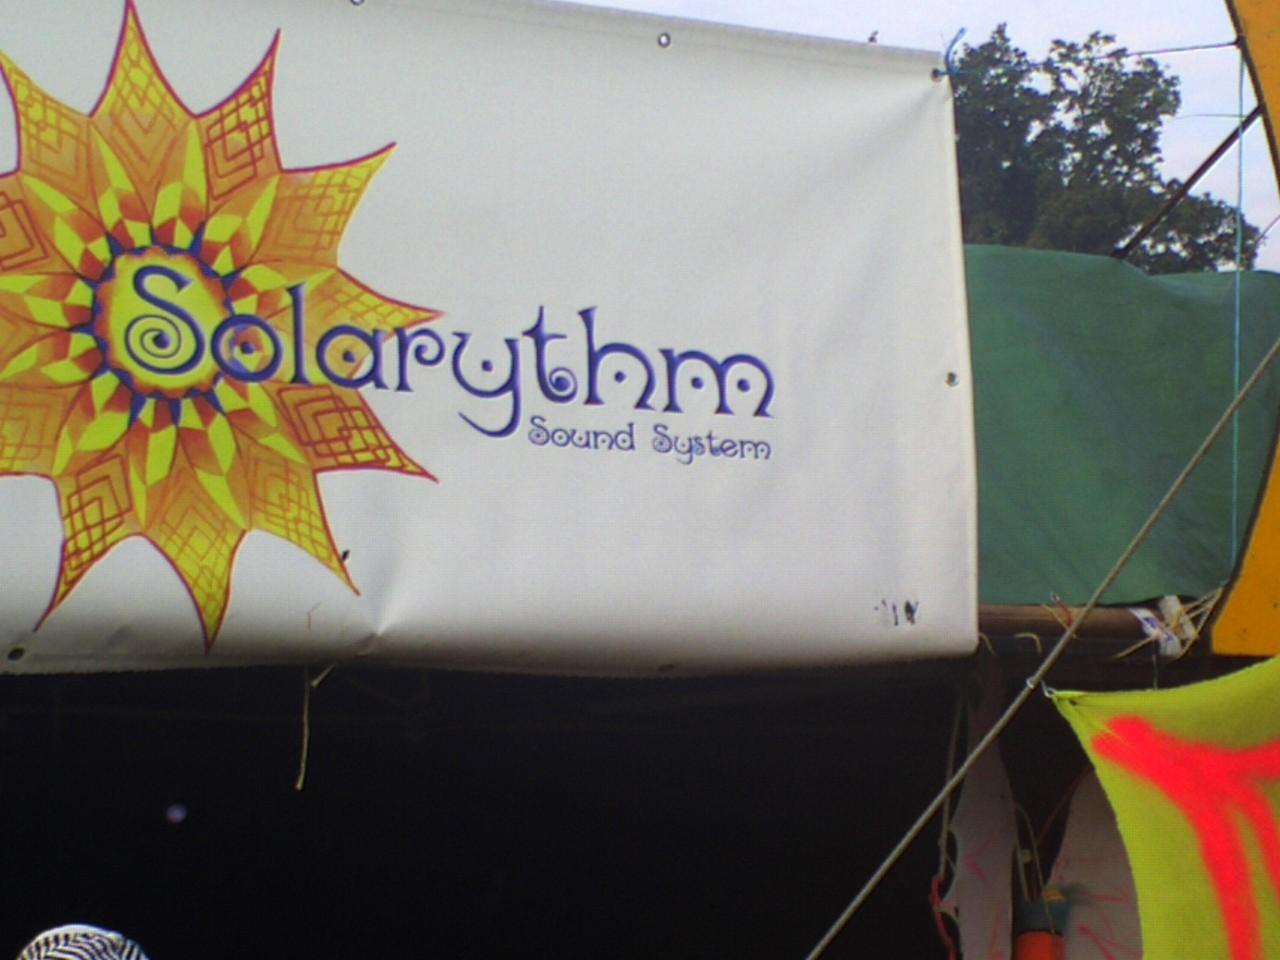 Solarythm